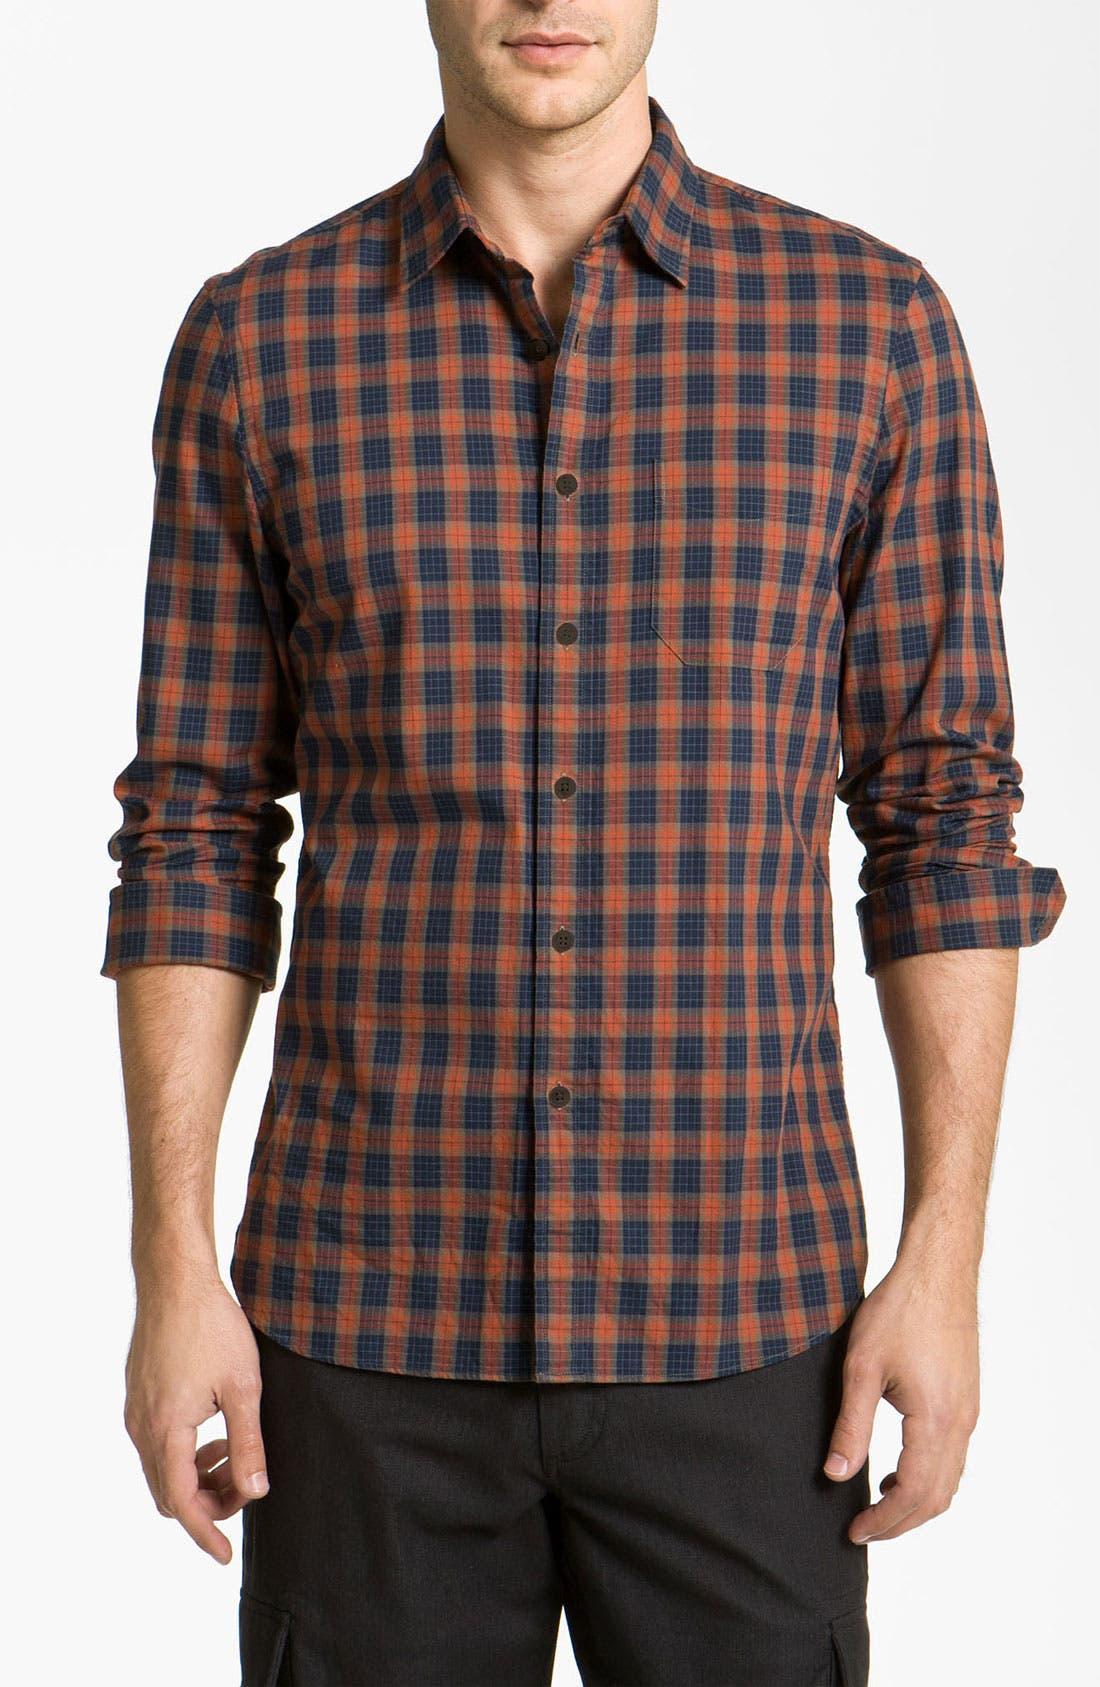 Main Image - Wallin & Bros. Plaid Sport Shirt